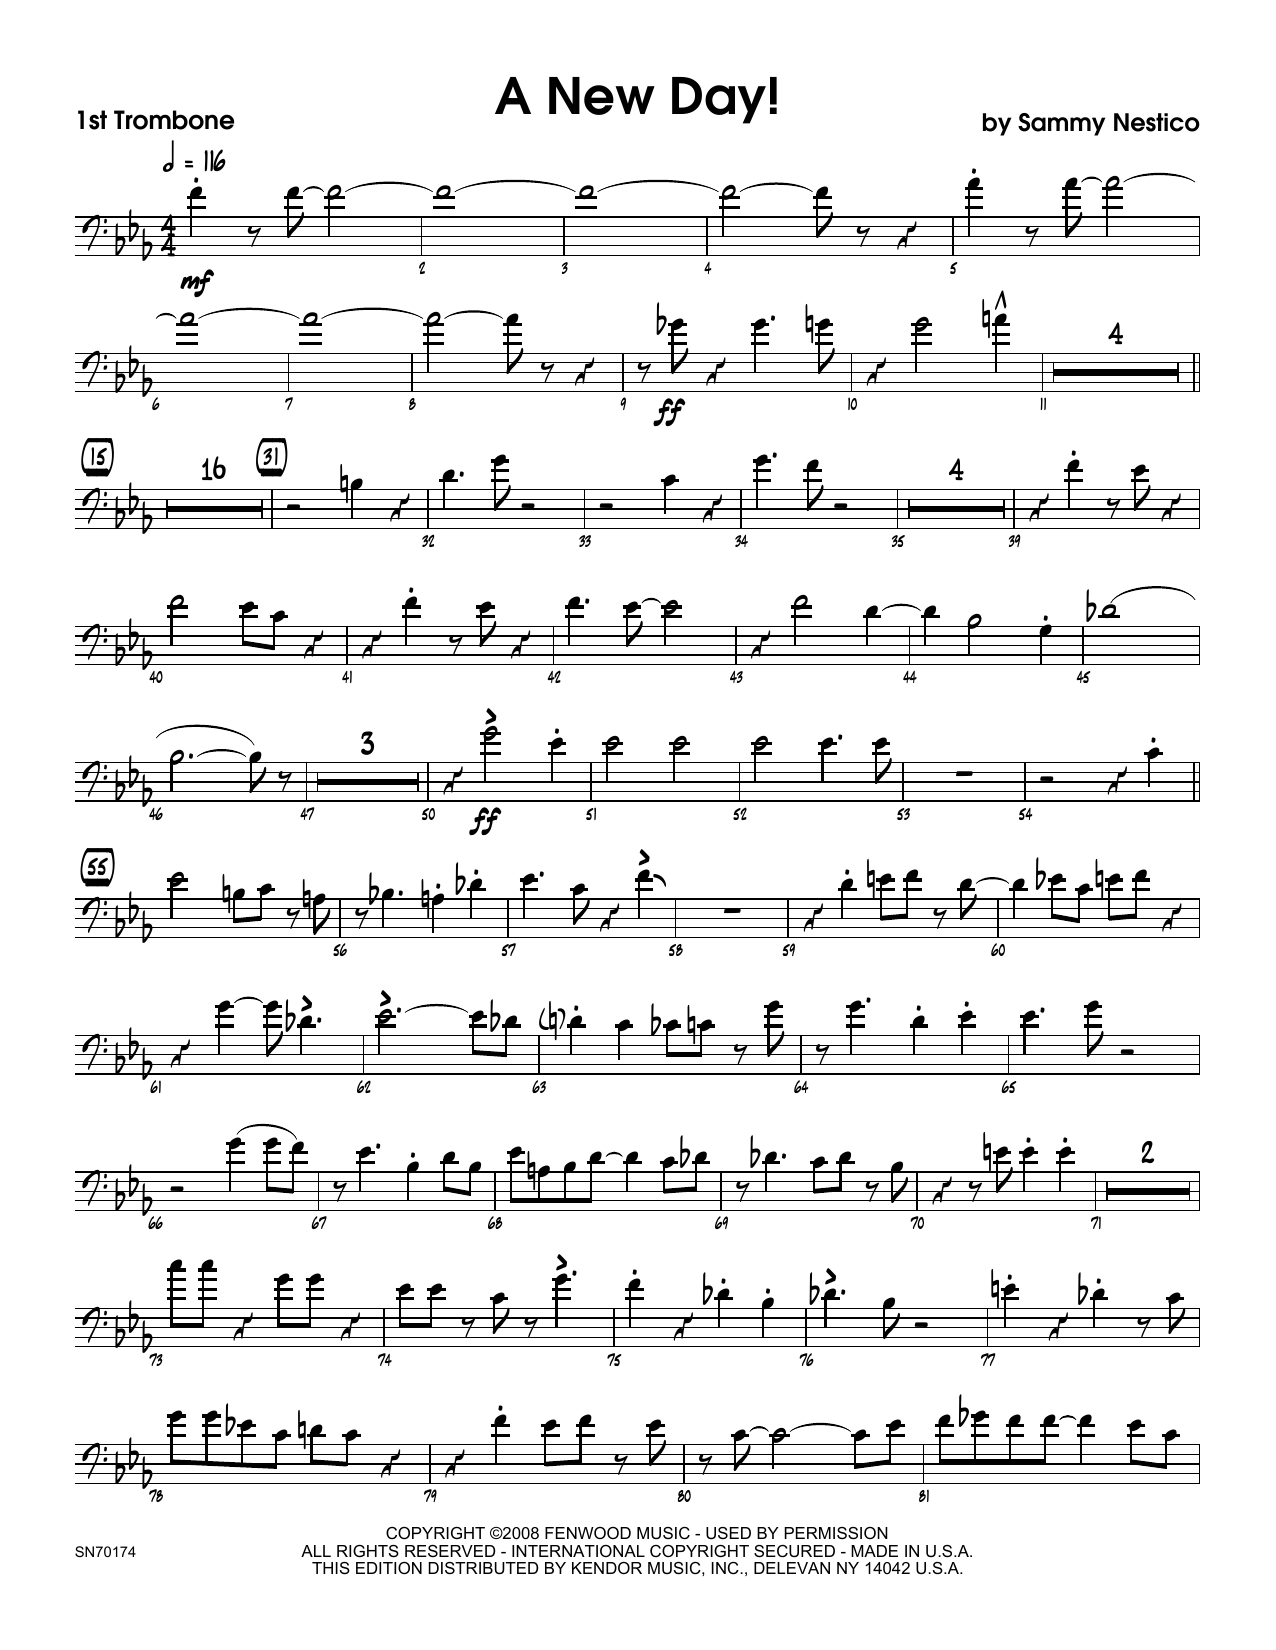 A New Day! - 1st Trombone Sheet Music